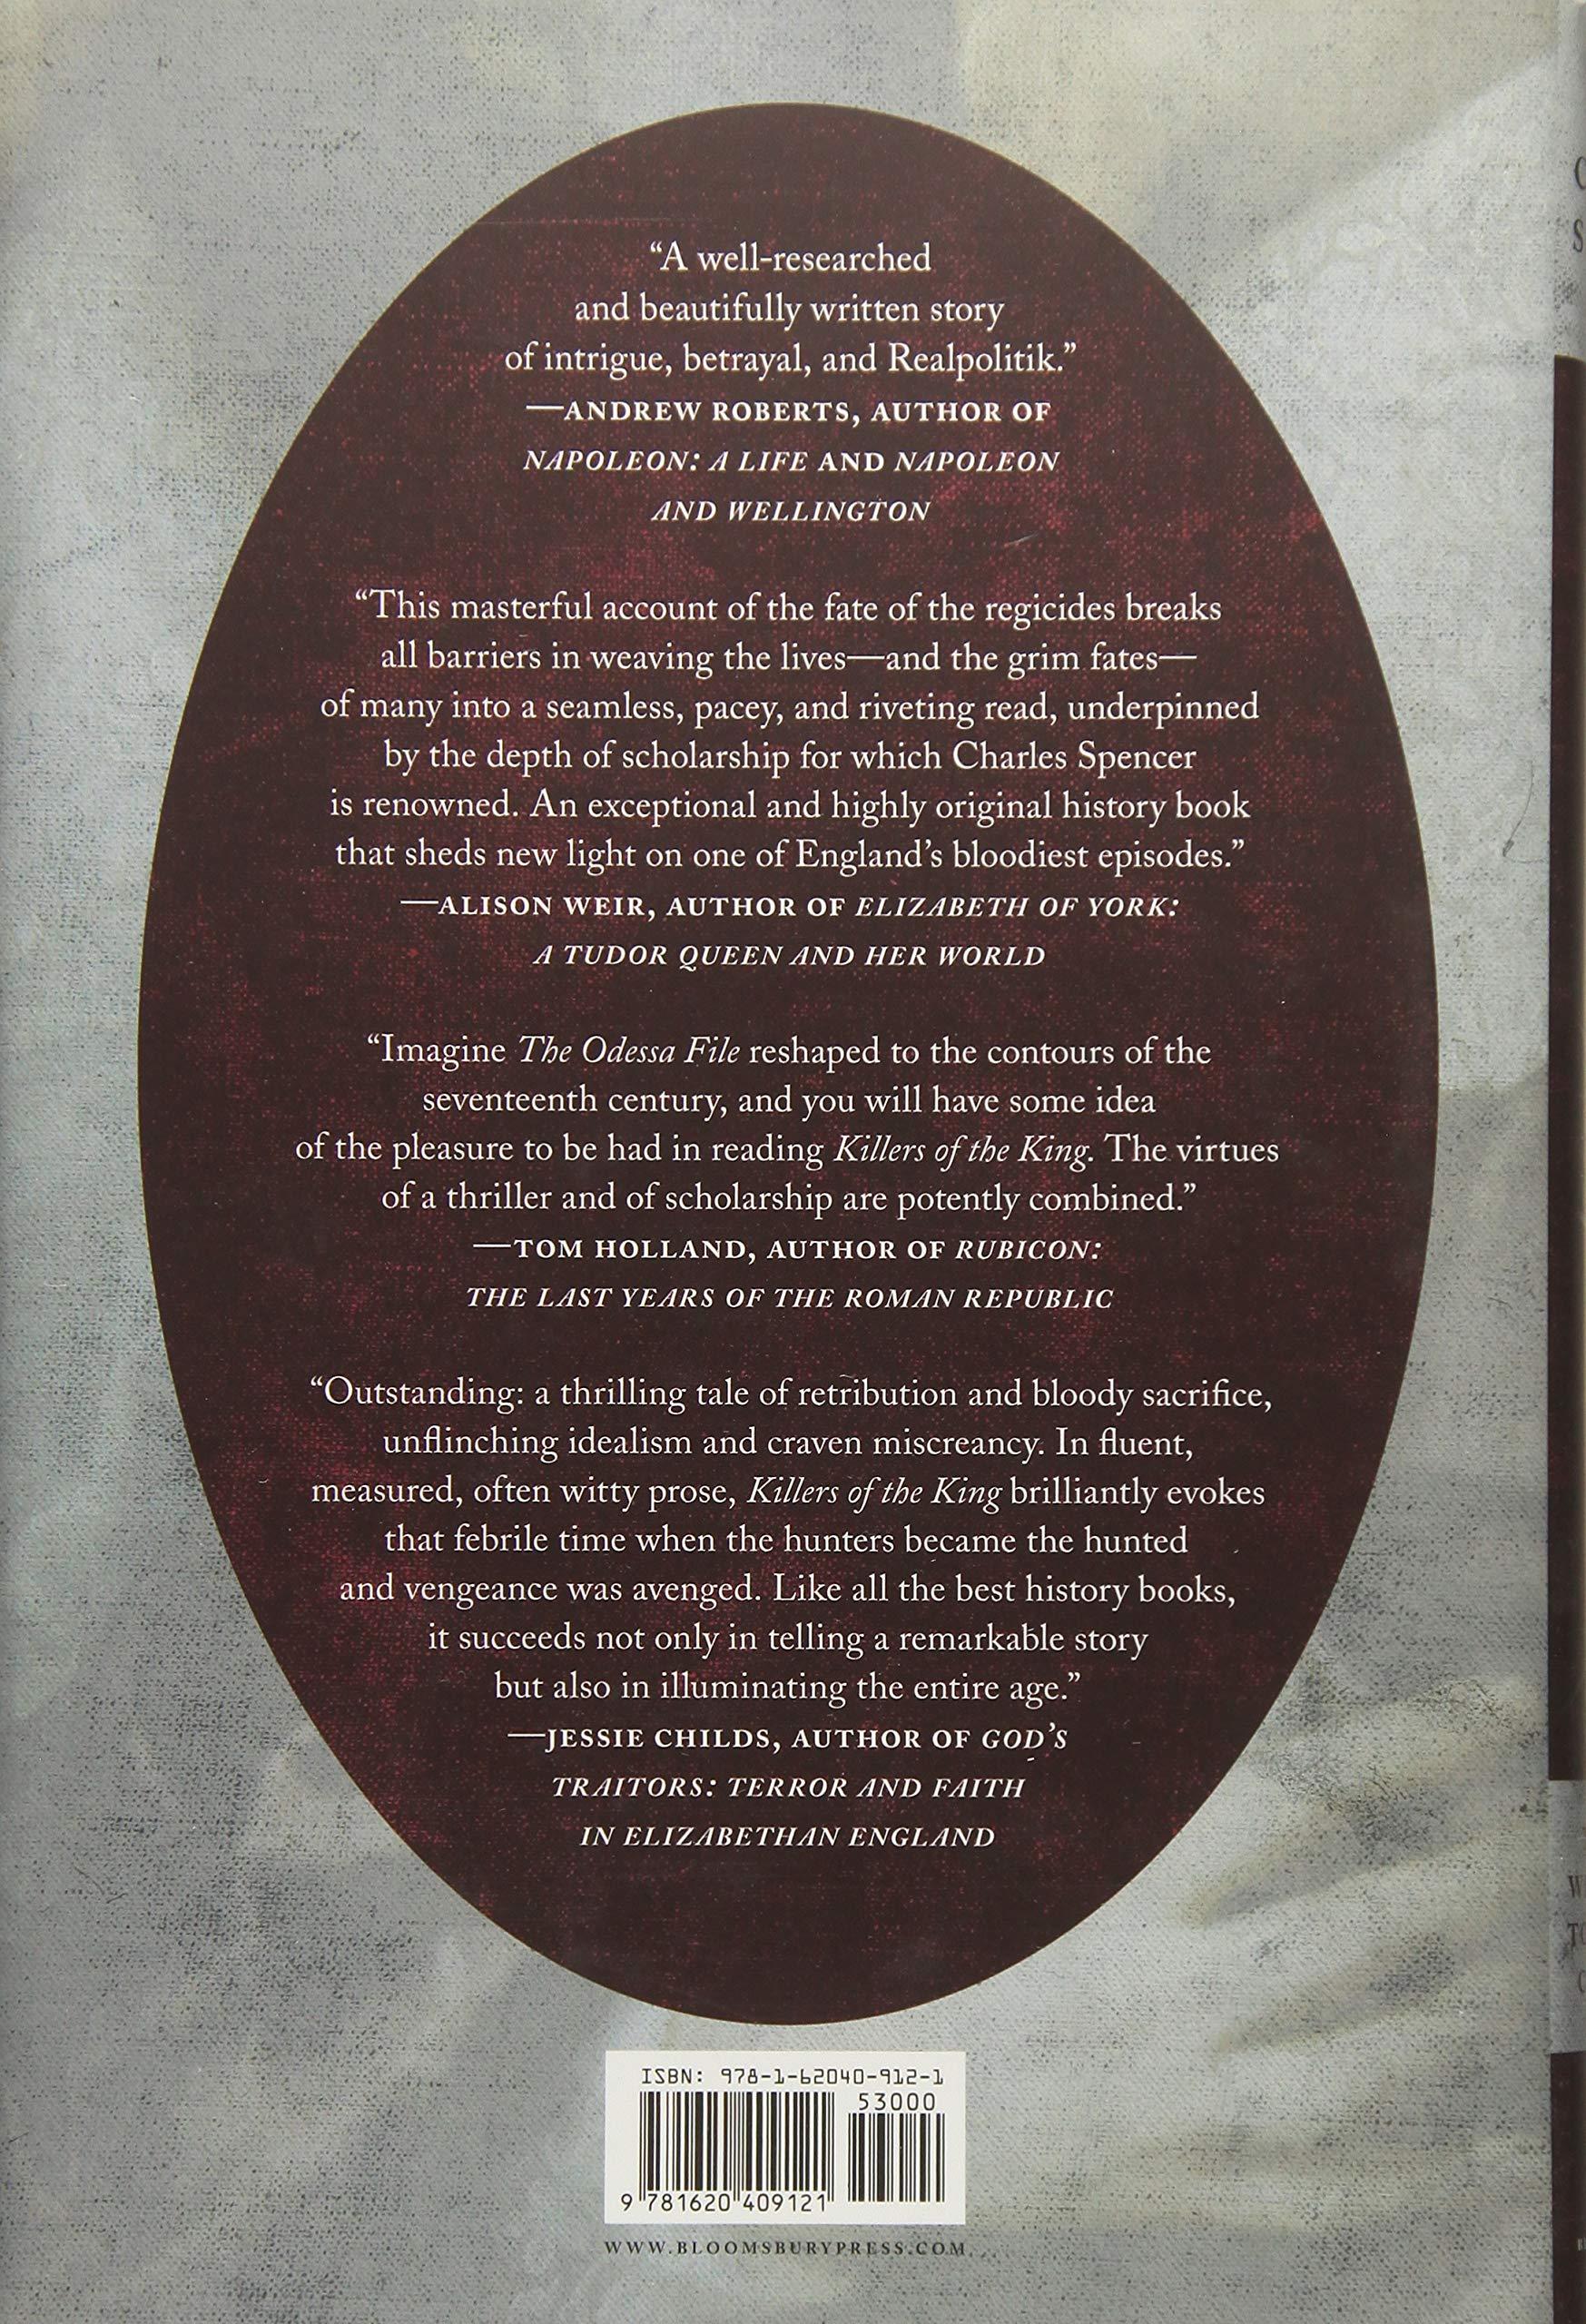 Killers of the King: The Men Who Dared to Execute Charles I: Amazon.es: Spencer, Charles: Libros en idiomas extranjeros